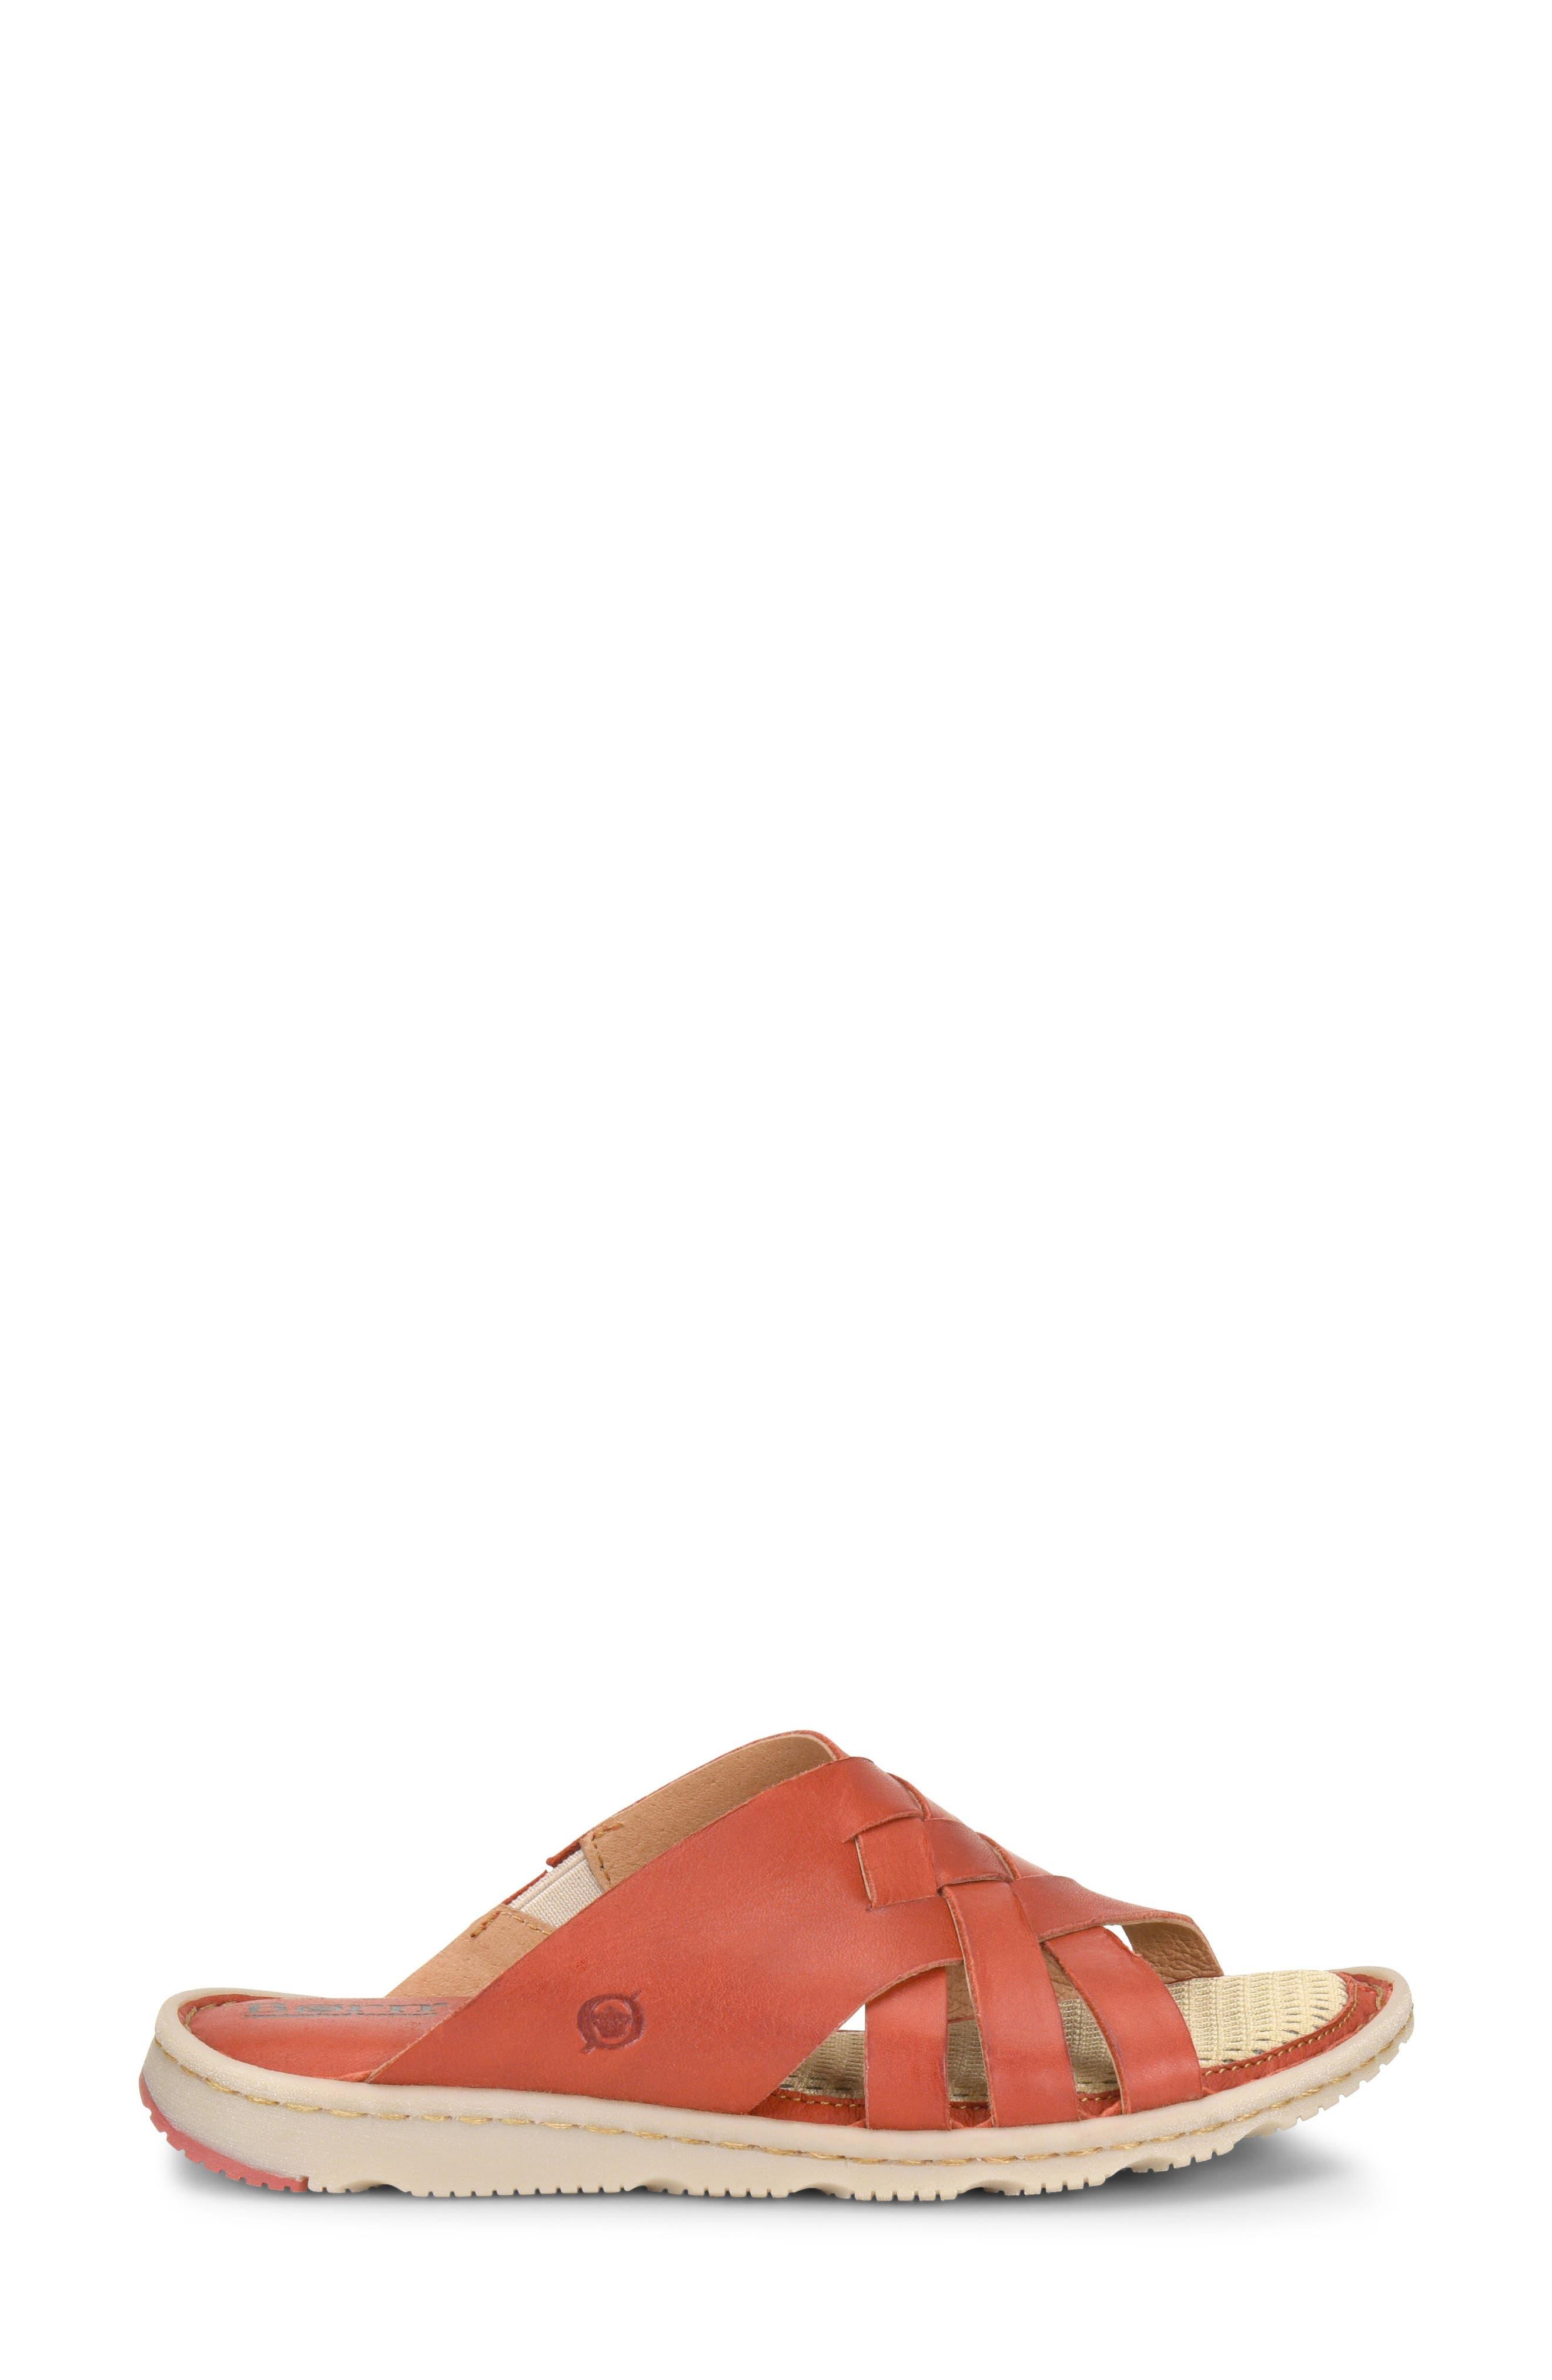 Tarpon Slide Sandal,                             Alternate thumbnail 12, color,